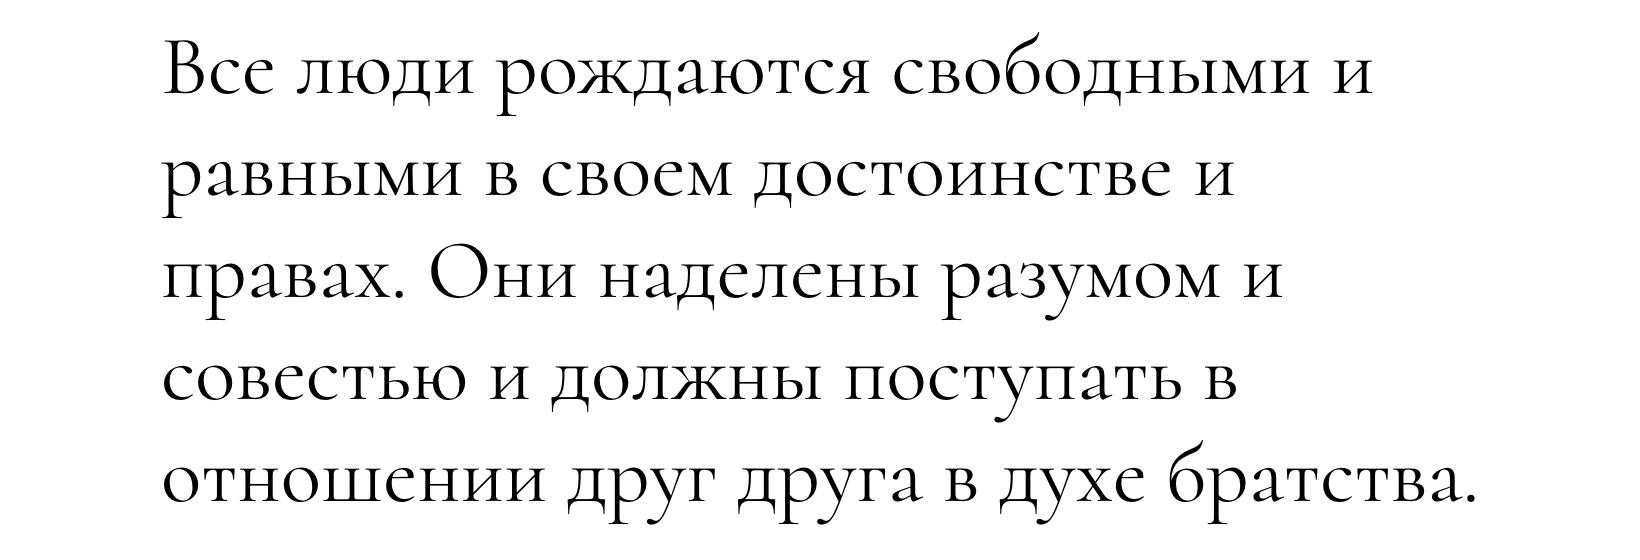 cormorant font banner5